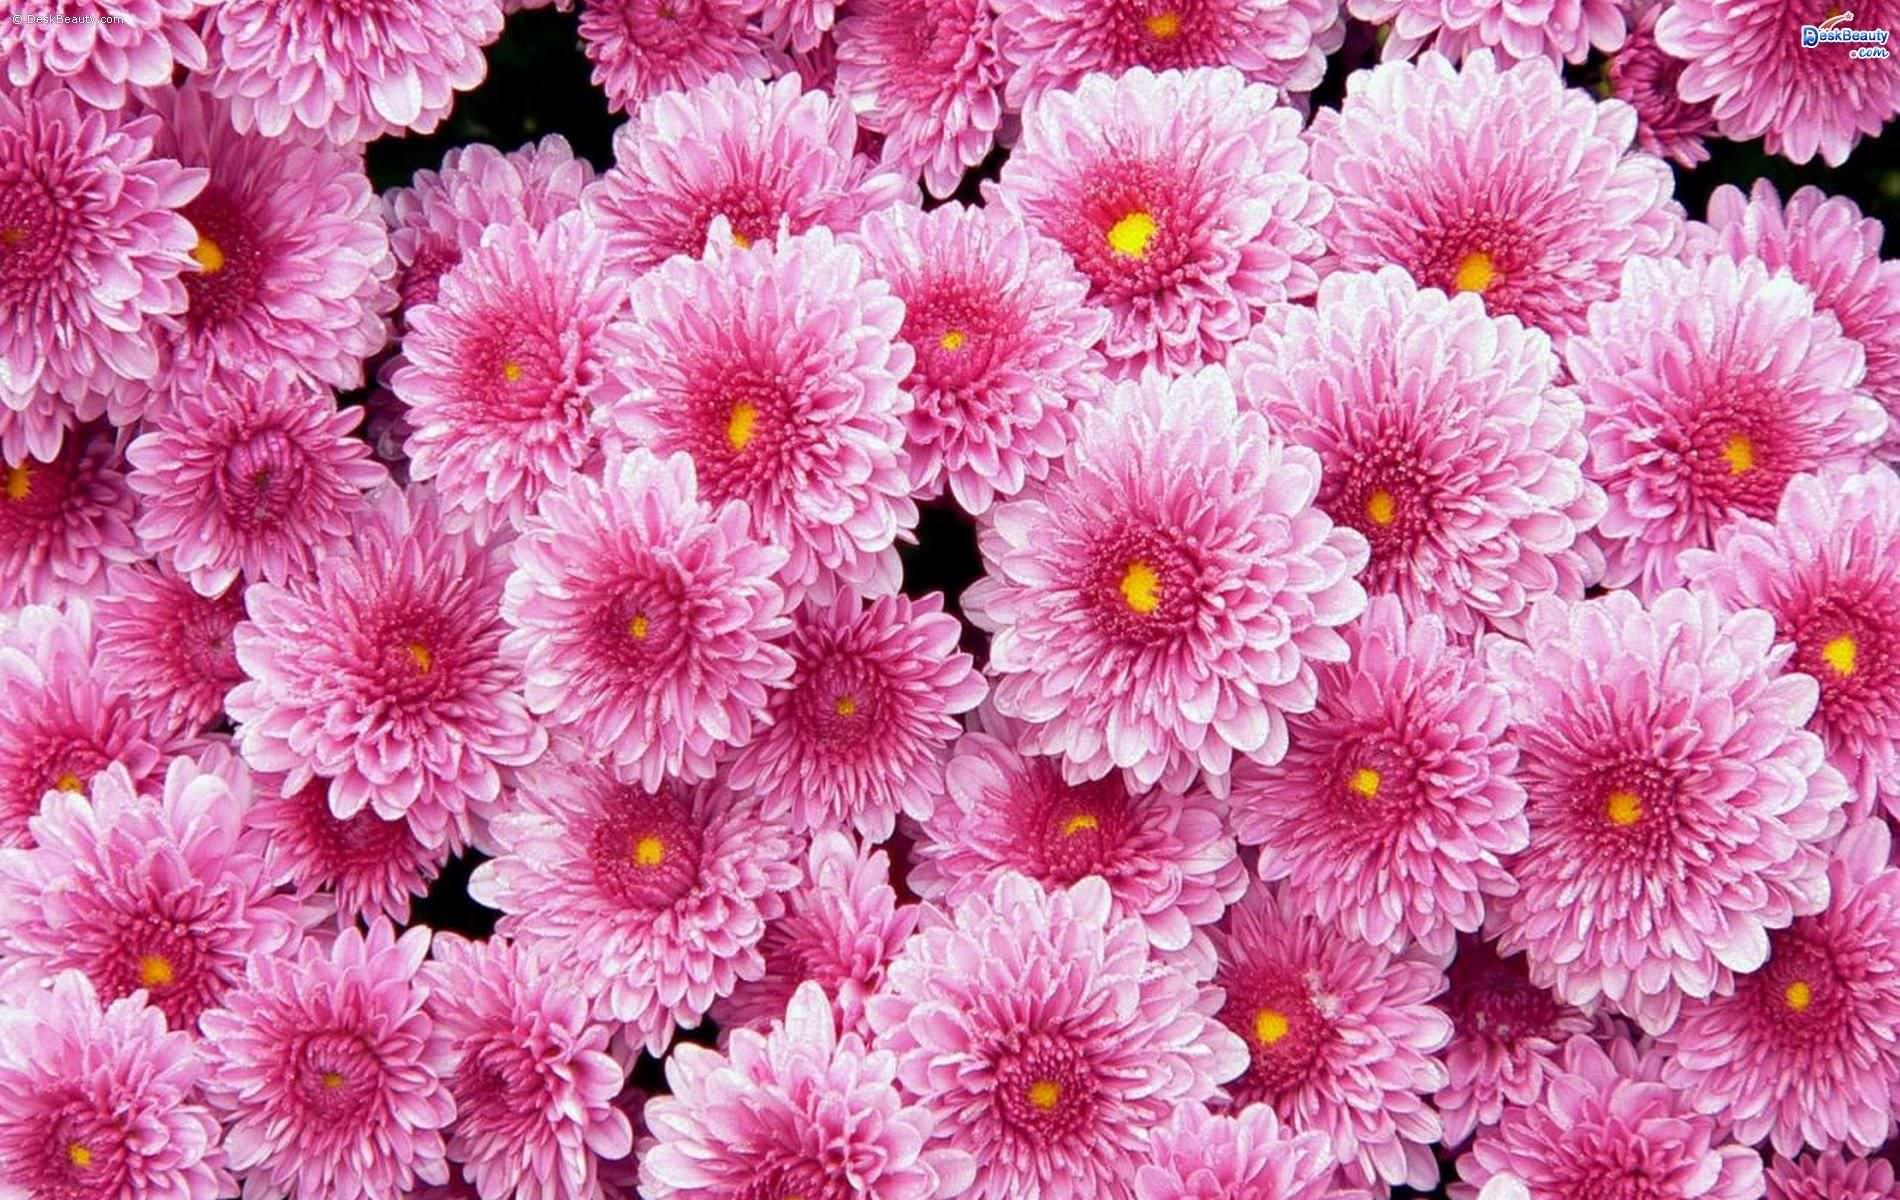 Pink Flower Backgrounds Hd Patternsprints Wallpapers